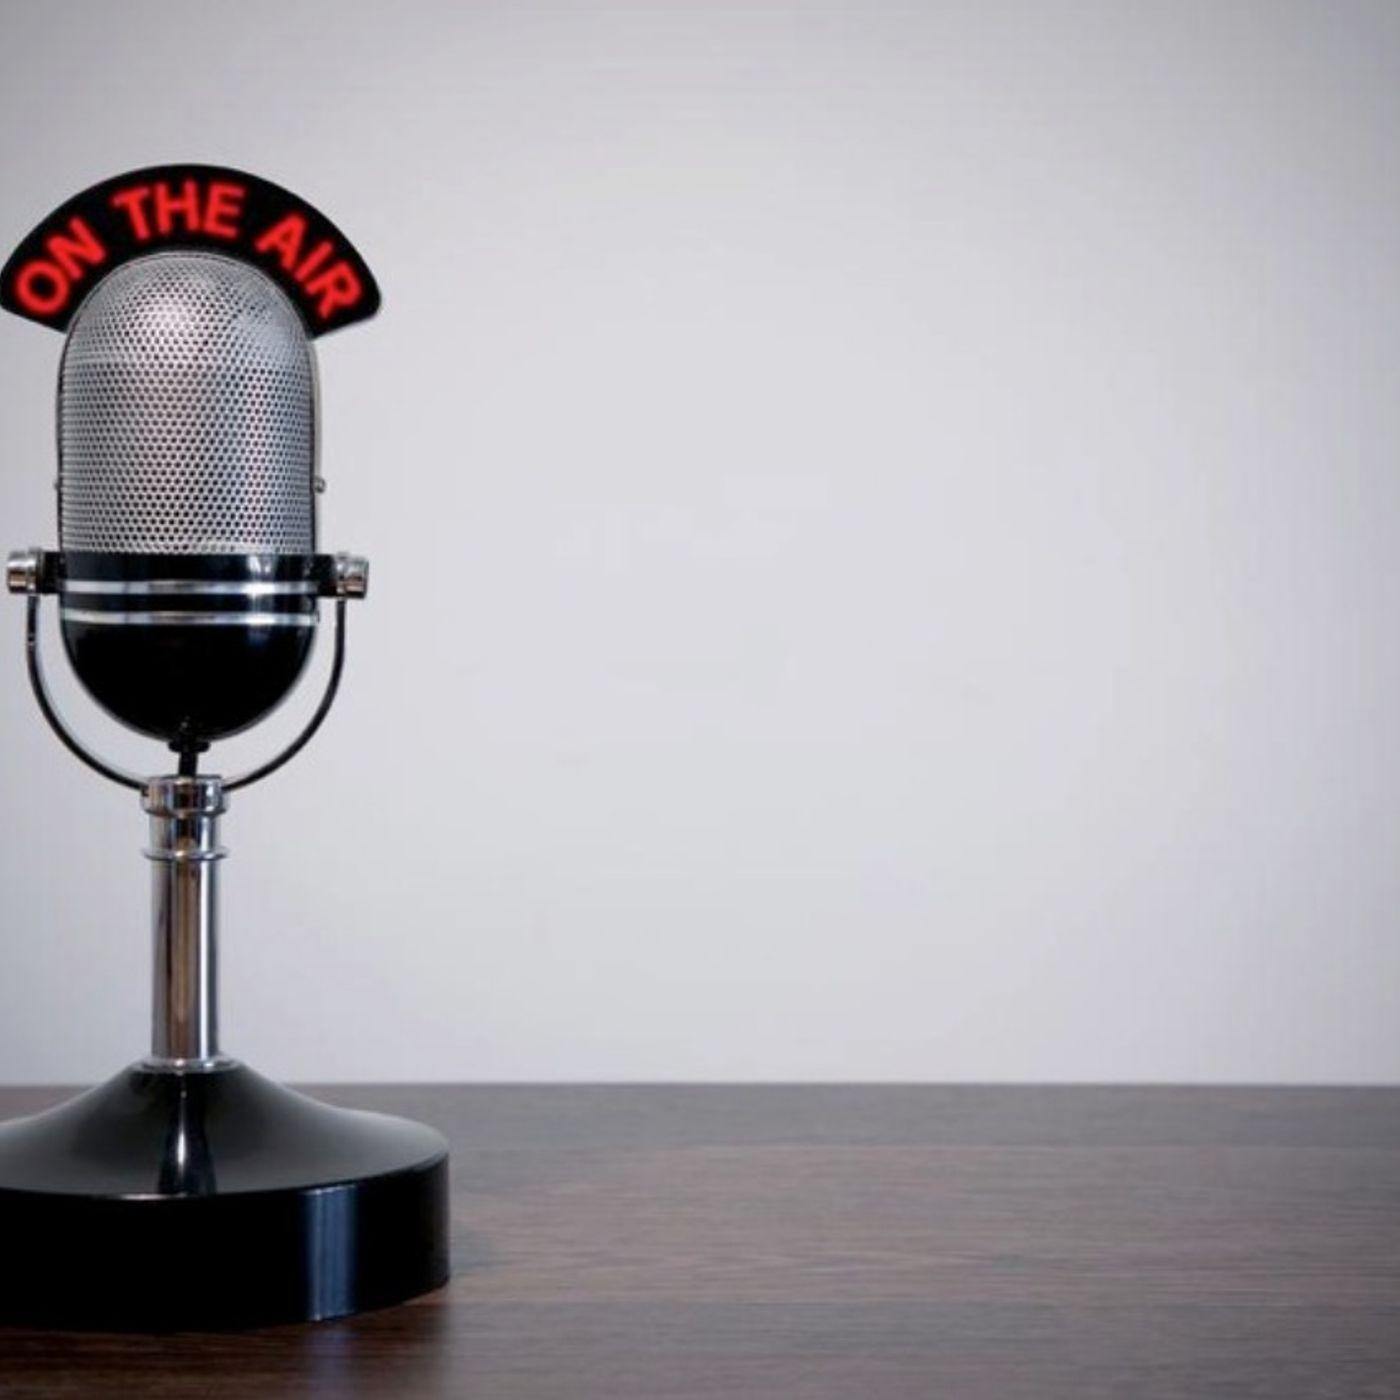 Change Matters Interview with Stinson Brown LAPD Gun Control